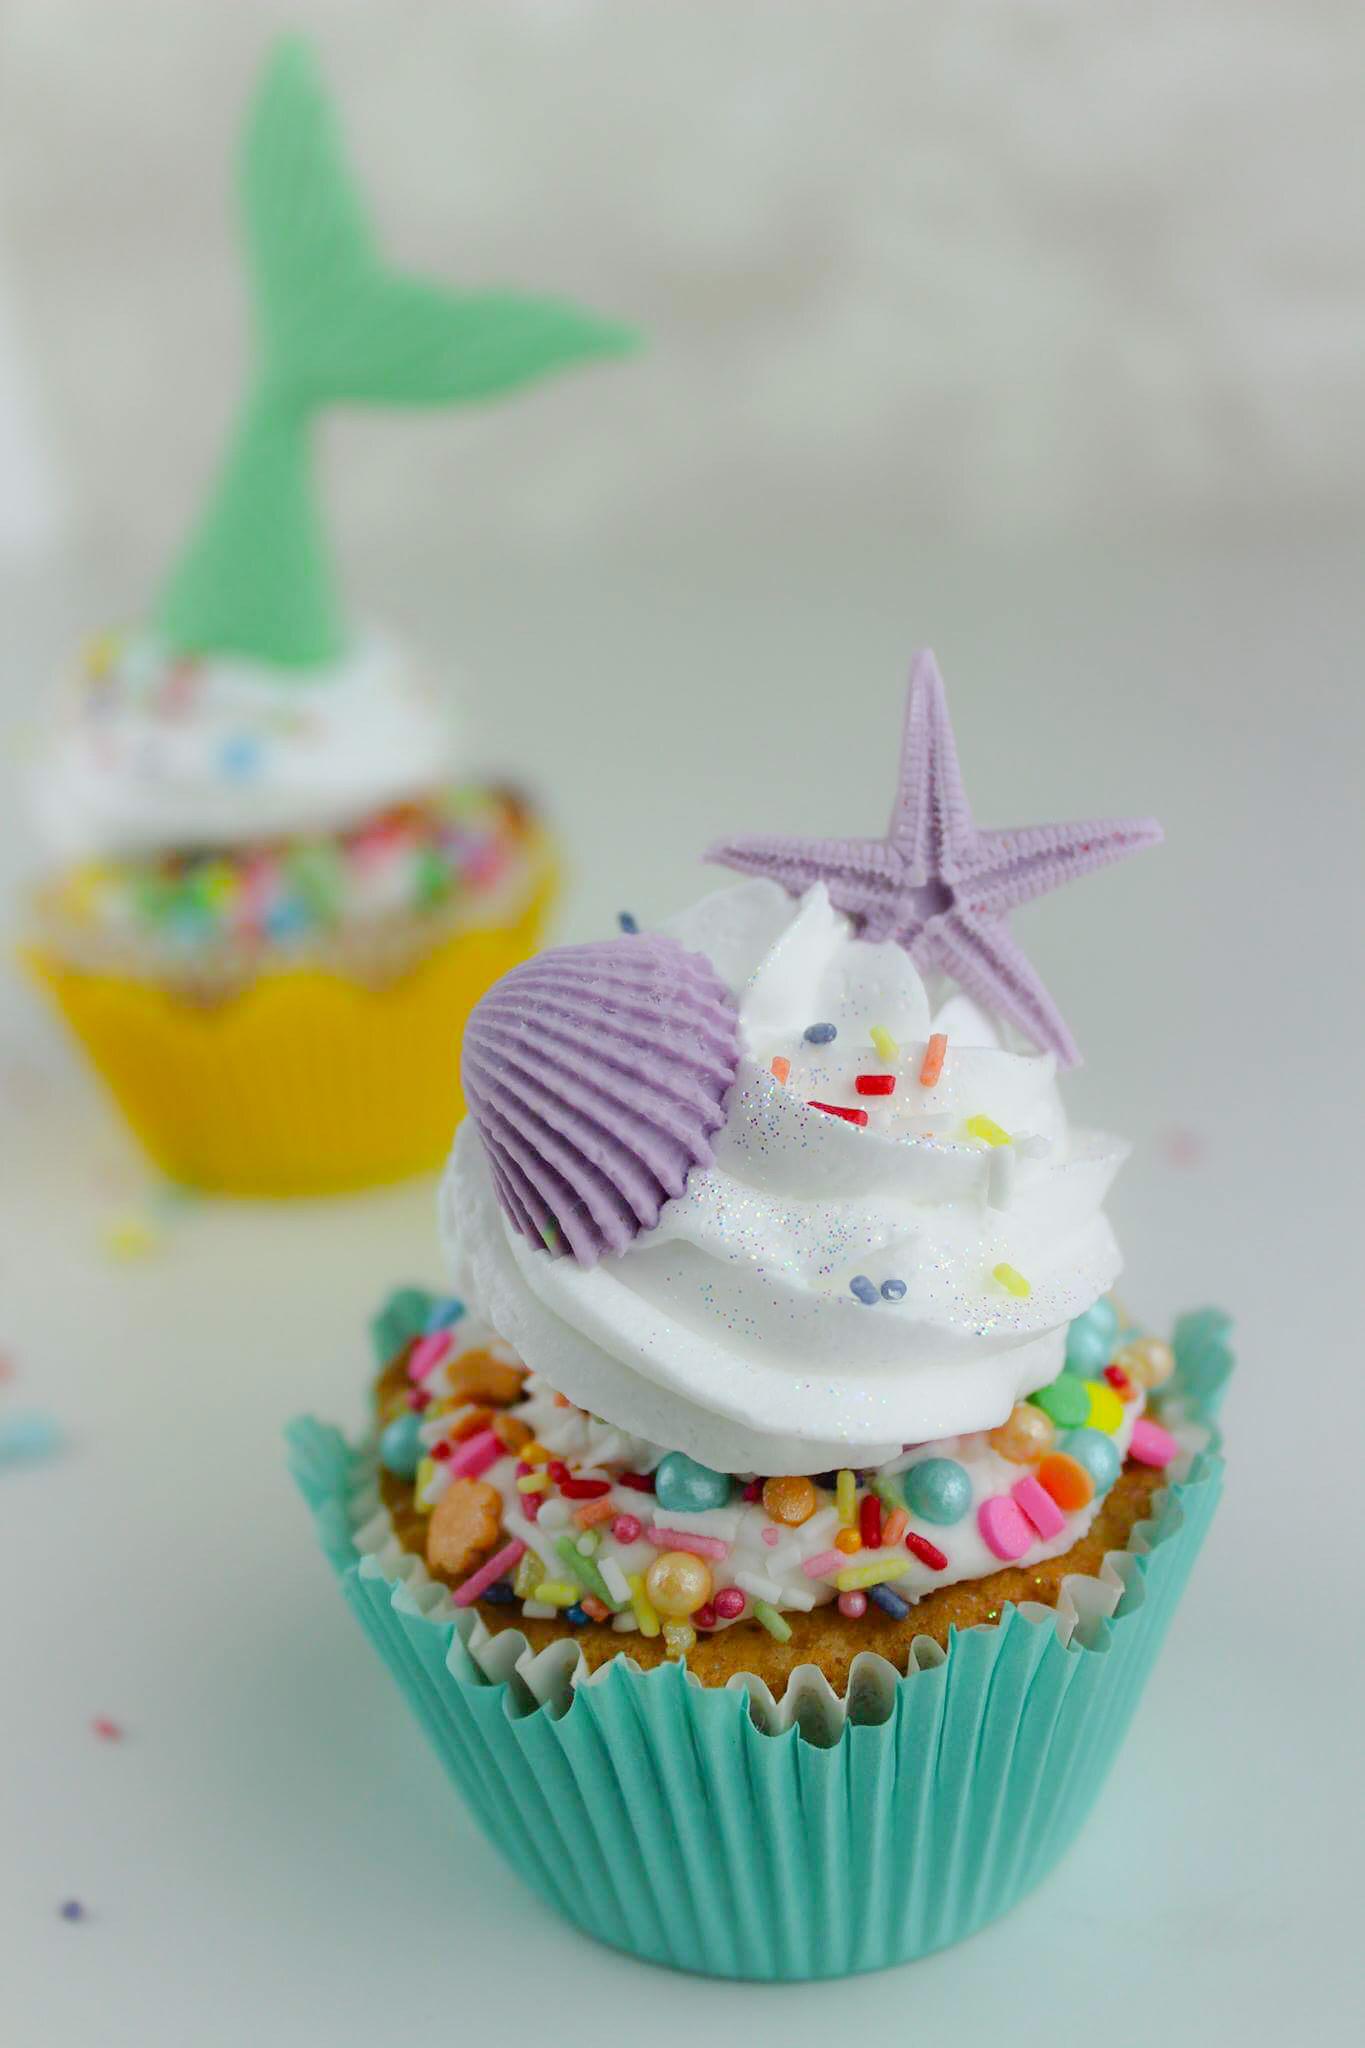 Seashell cupcake toppers